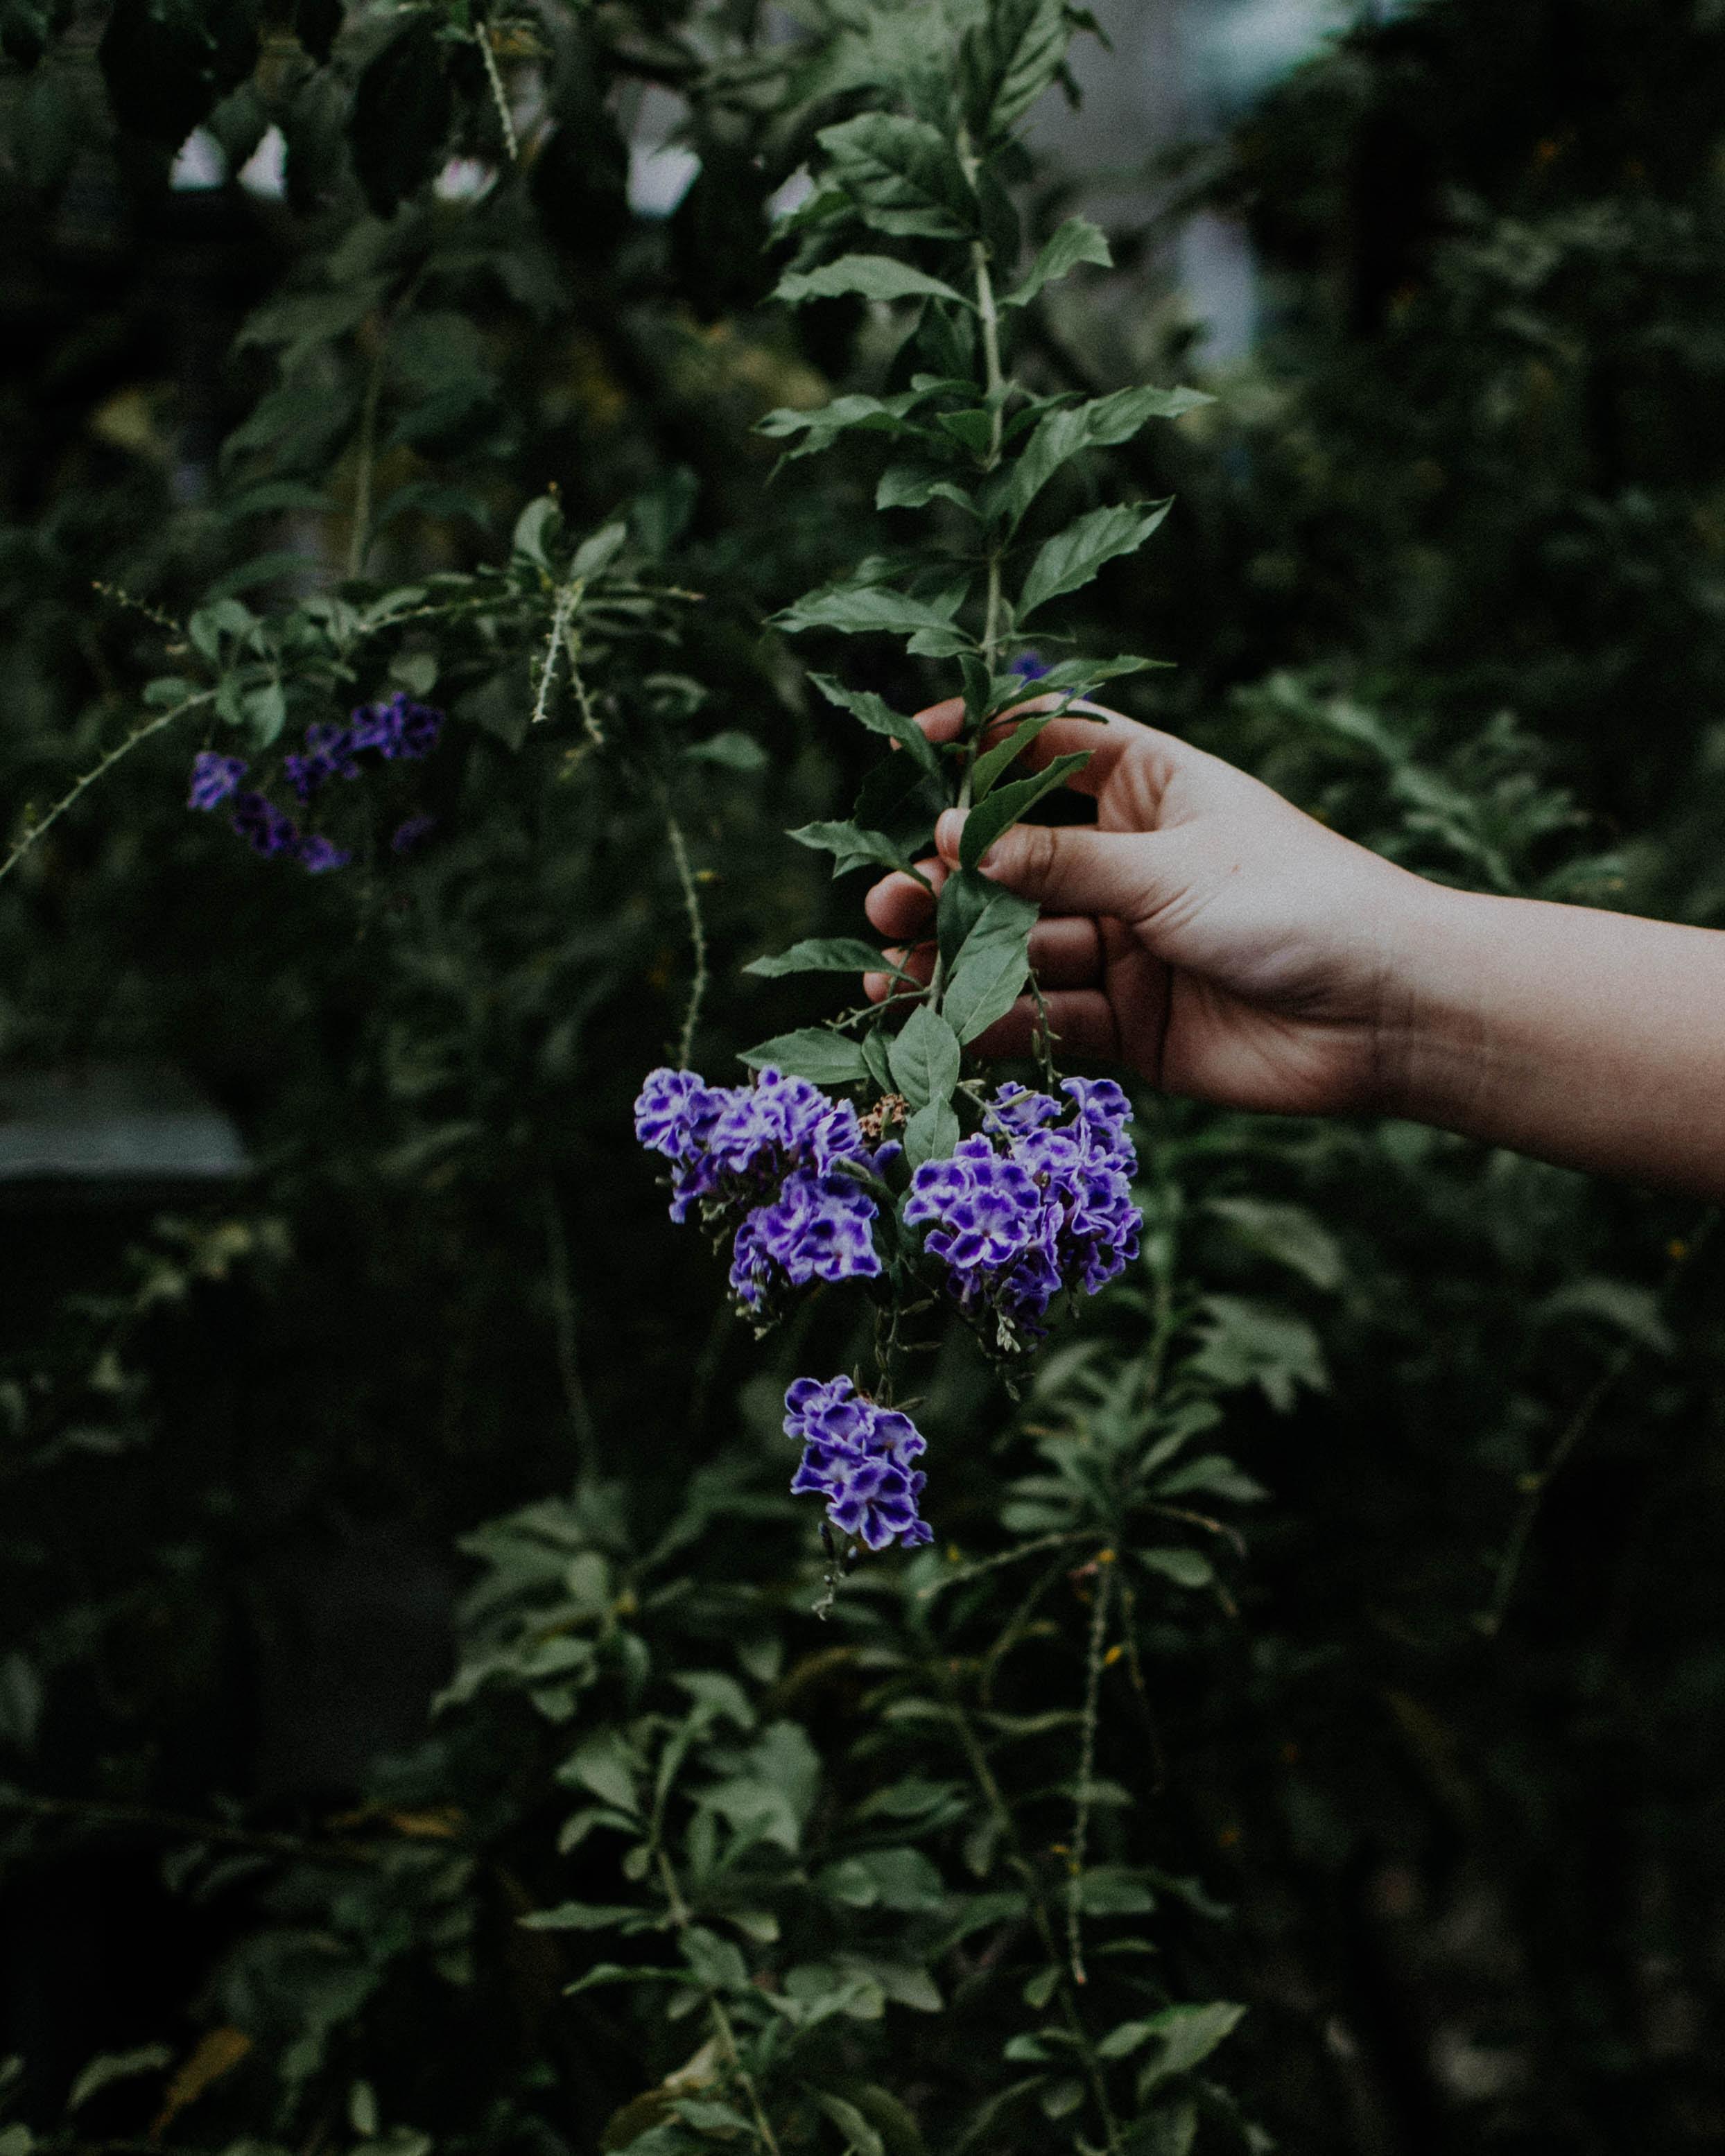 person holding purple petal flower